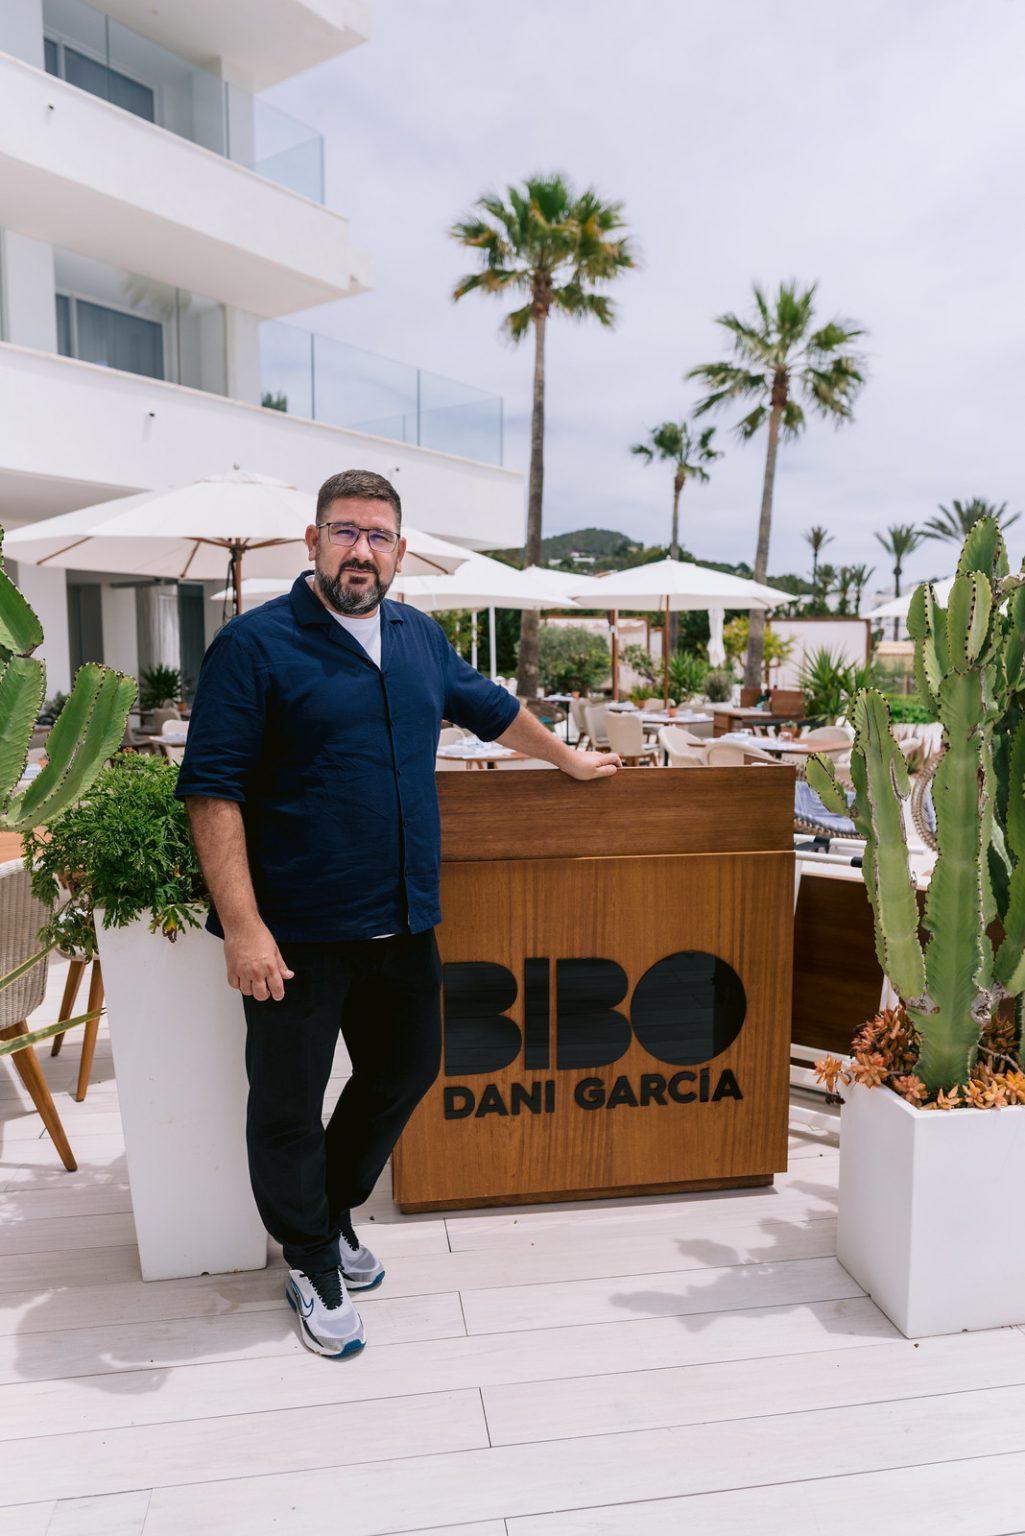 https://www.white-ibiza.com/wp-content/uploads/2021/06/white-ibiza-restaurants-bibo-ibiza-bay-02-1025x1536.jpg